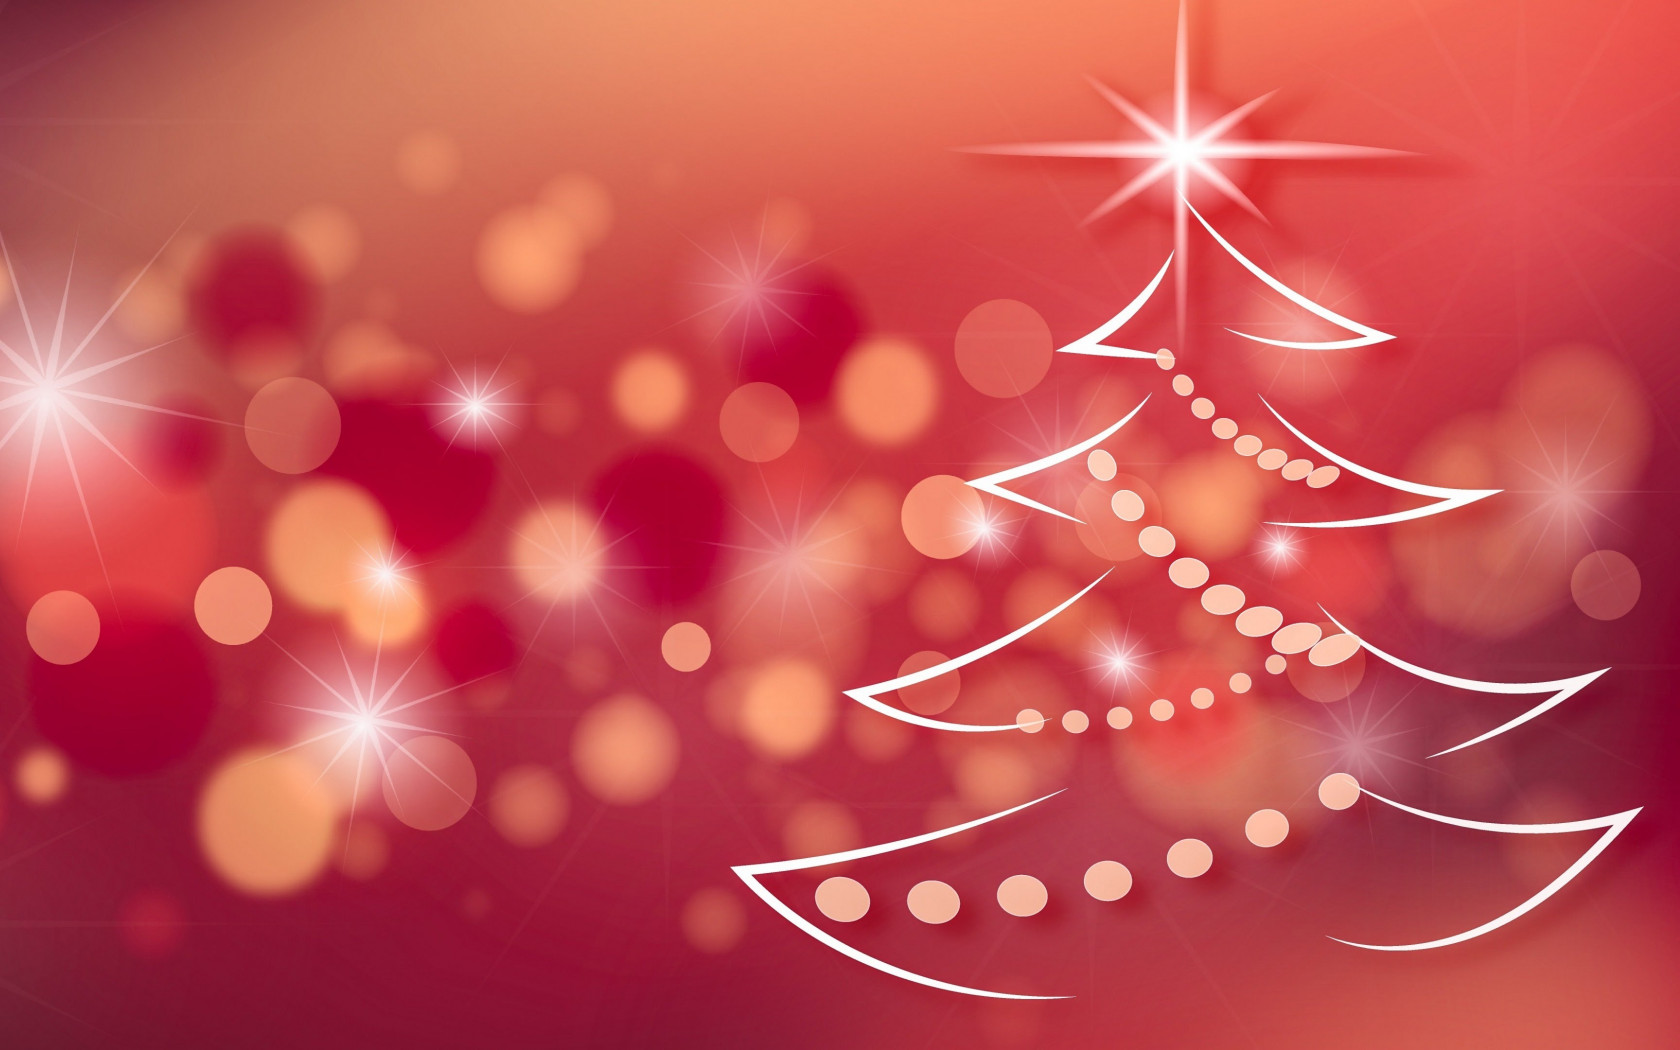 Download Wallpaper: Christmas Tree 1680x1050